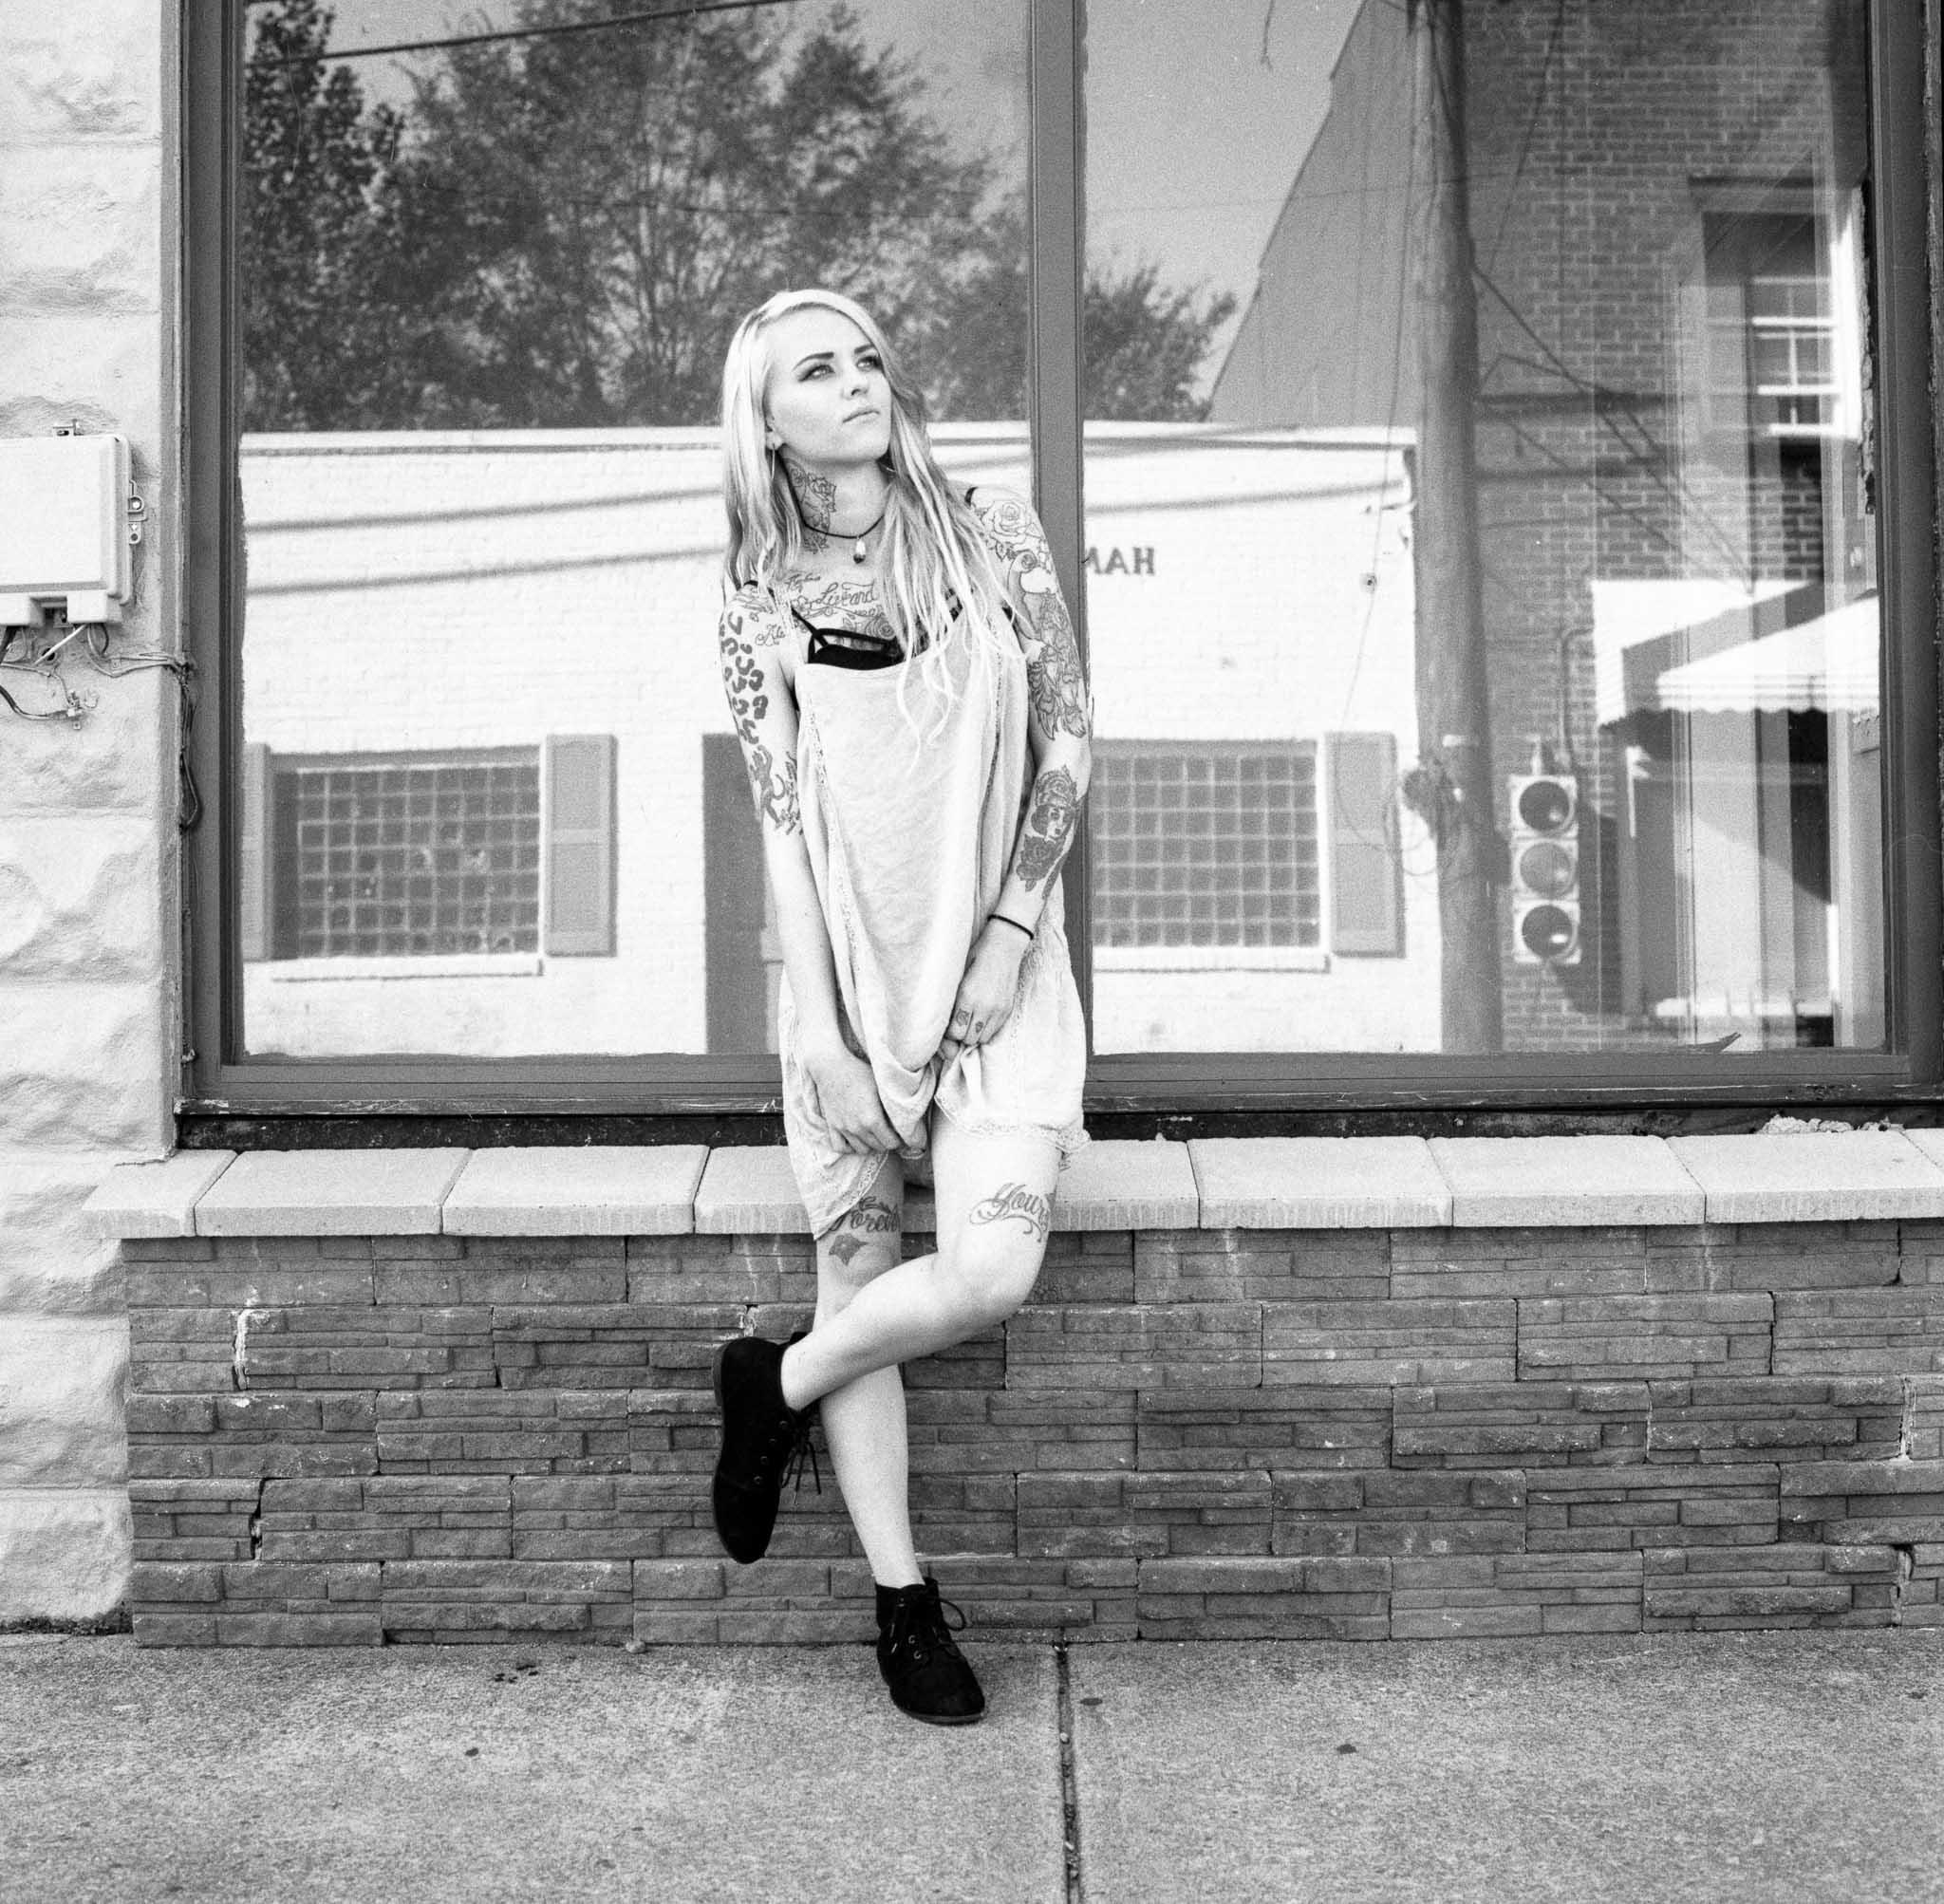 Model: Mykayla Mckenzie  Camera: Hasselblad 501CM  Film: HP5+ @1600